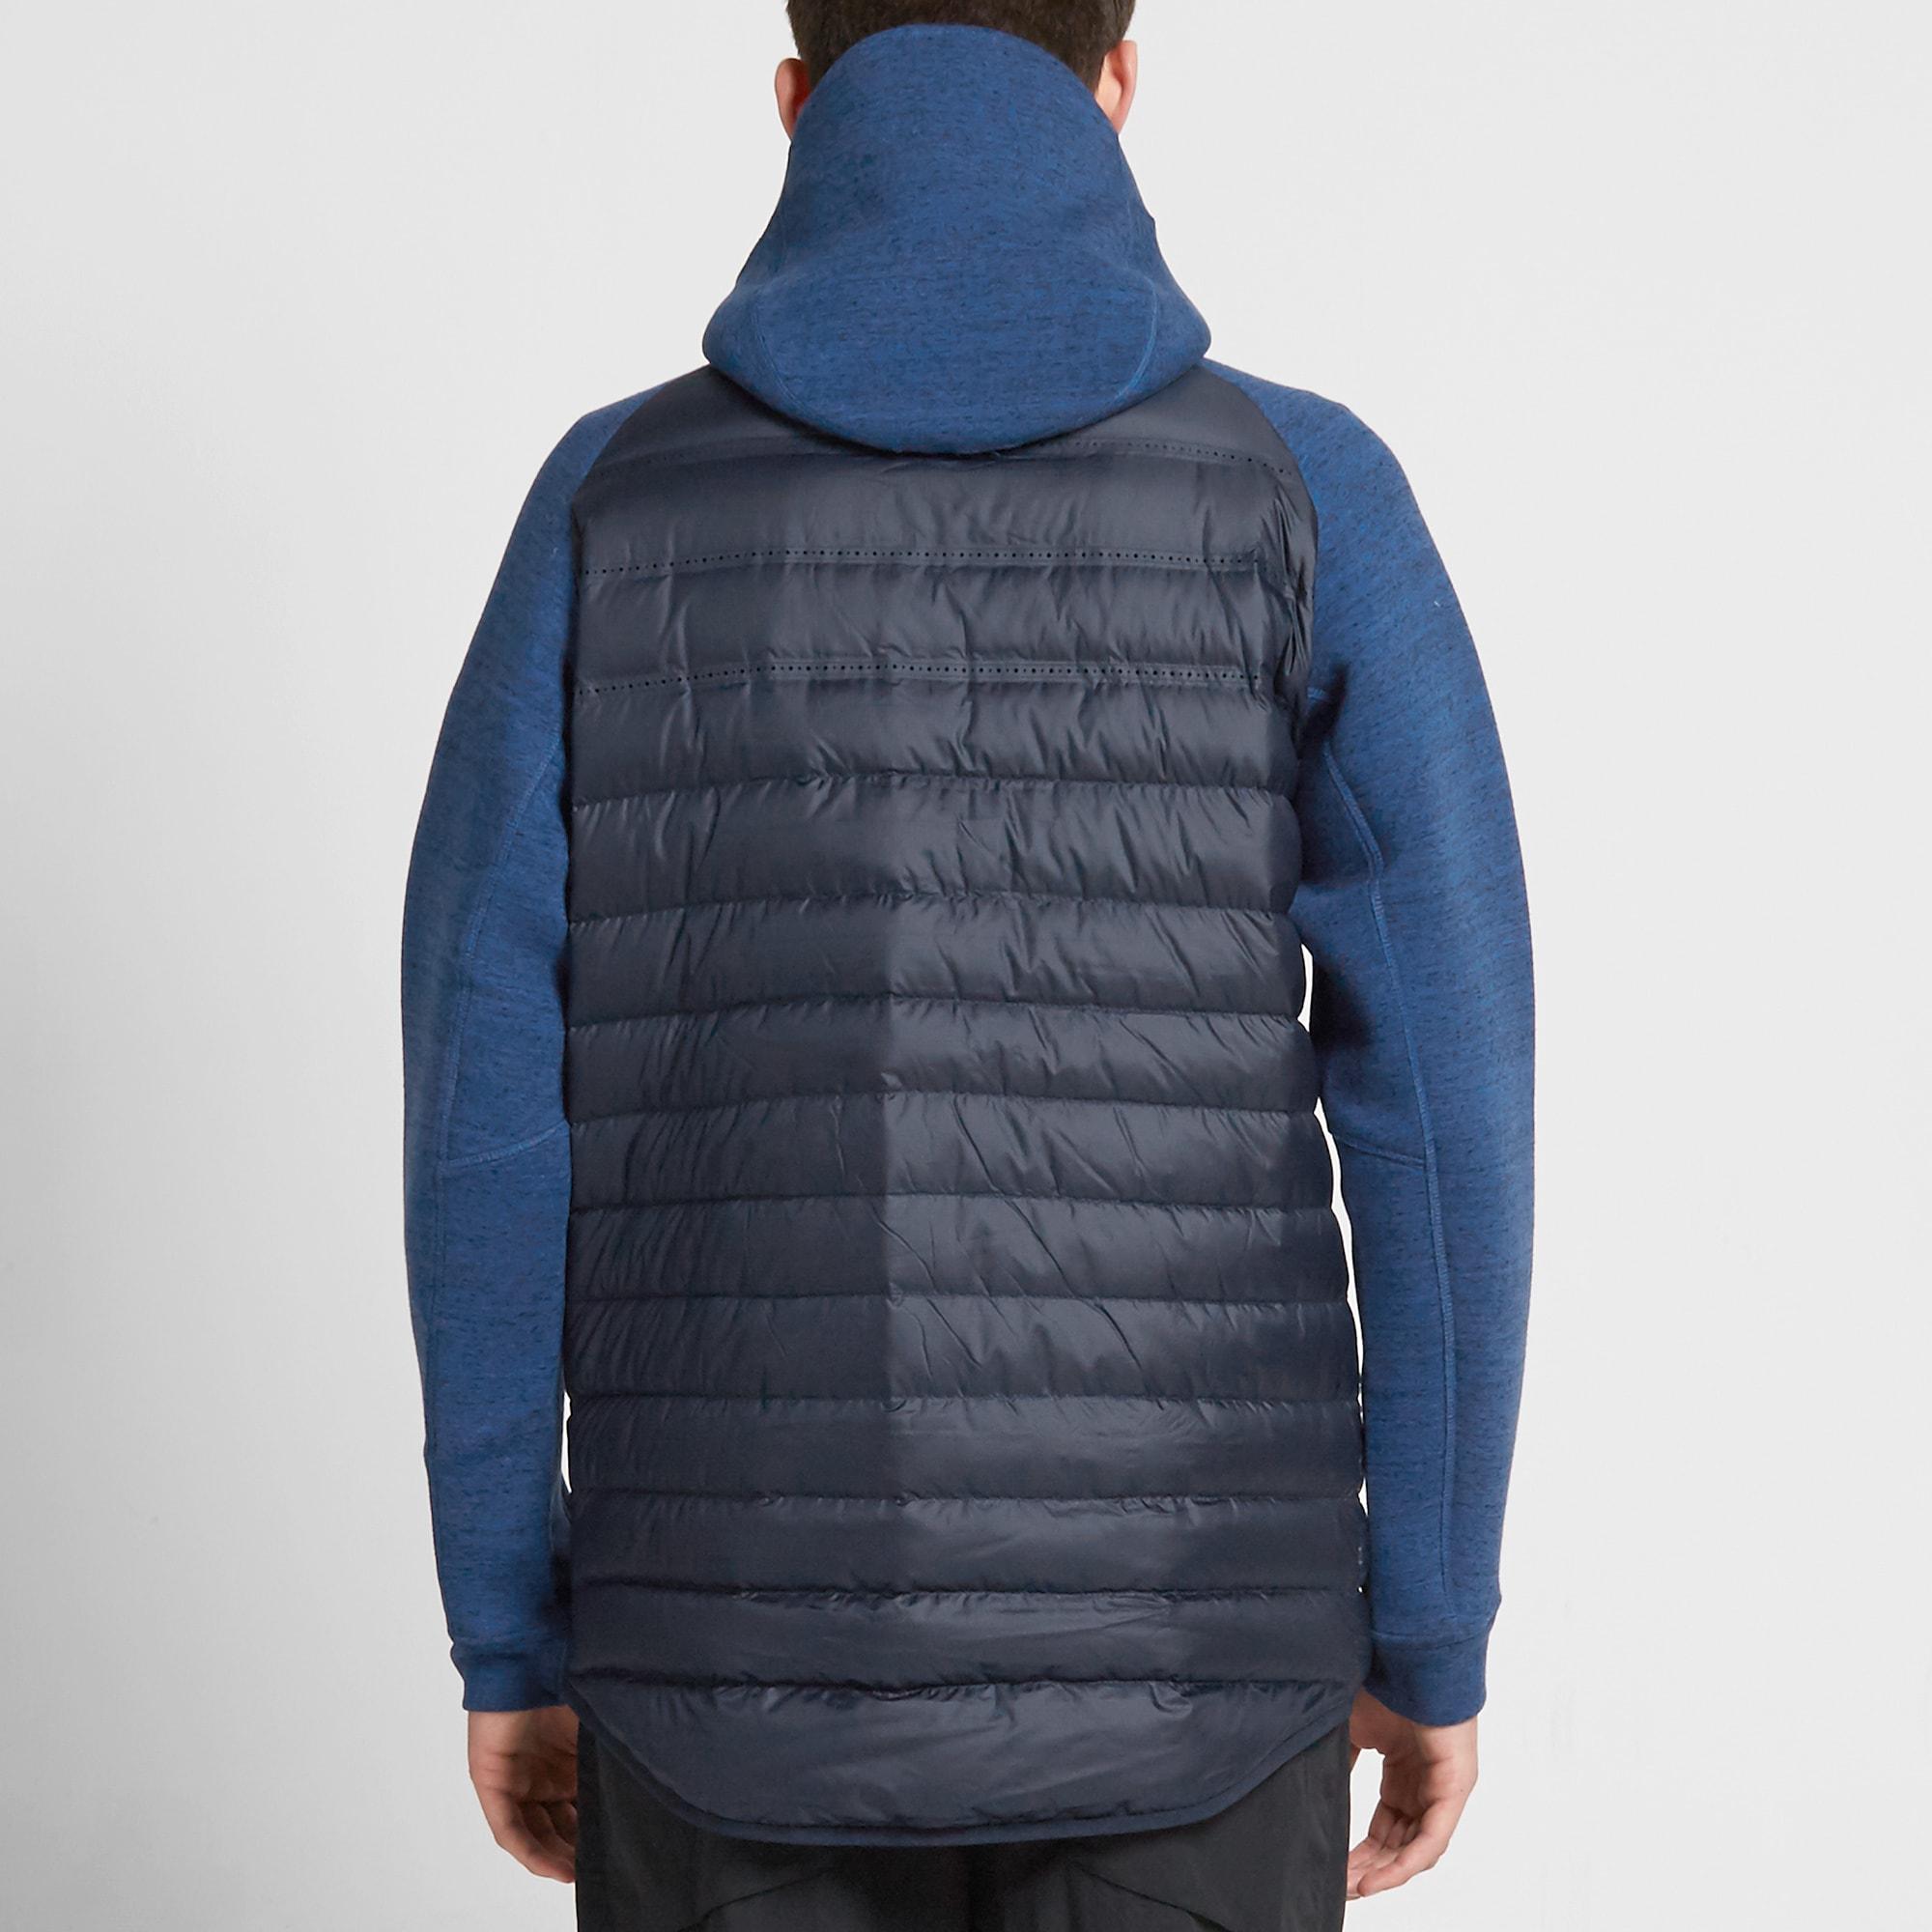 prima vendedor saldar  Nike Tech Fleece Aeroloft Jacket Obsidian & Game Royal | END.